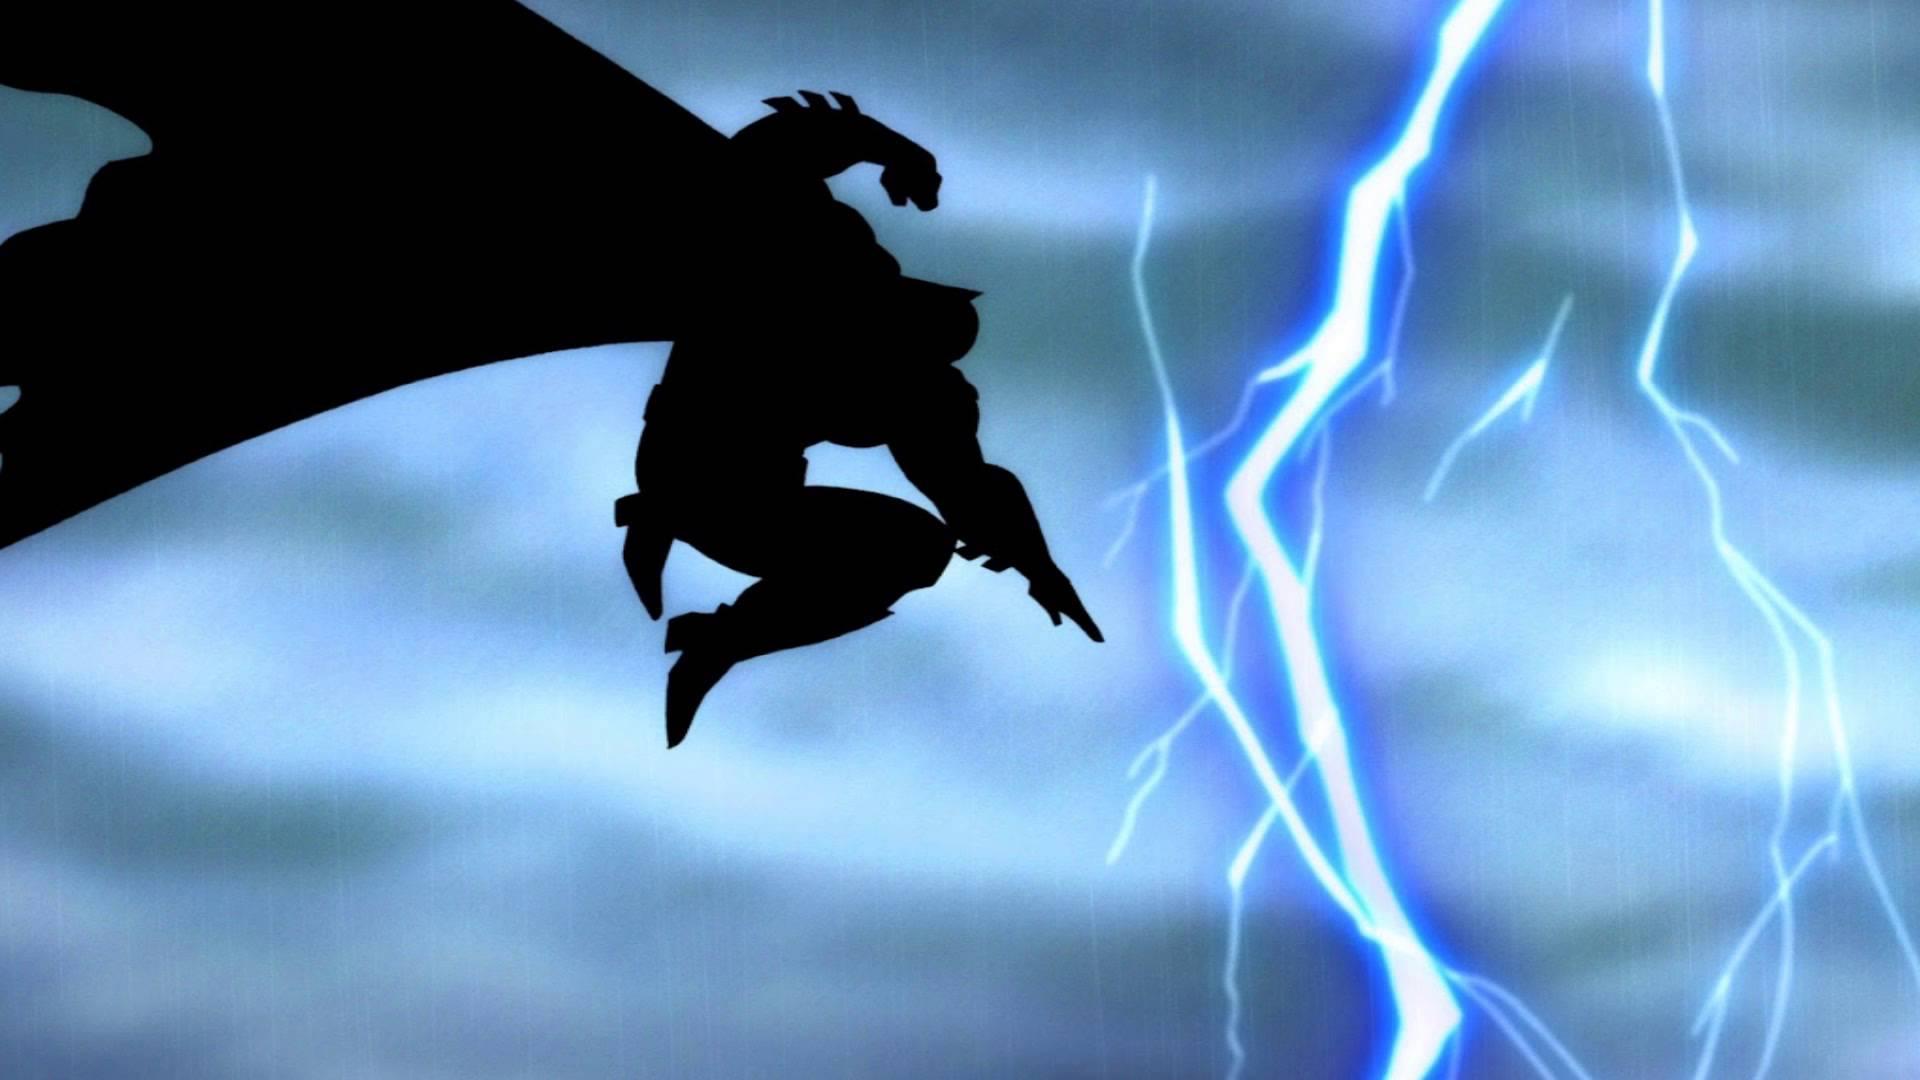 31+] Awesome HD Dark Knight Wallpaper ...